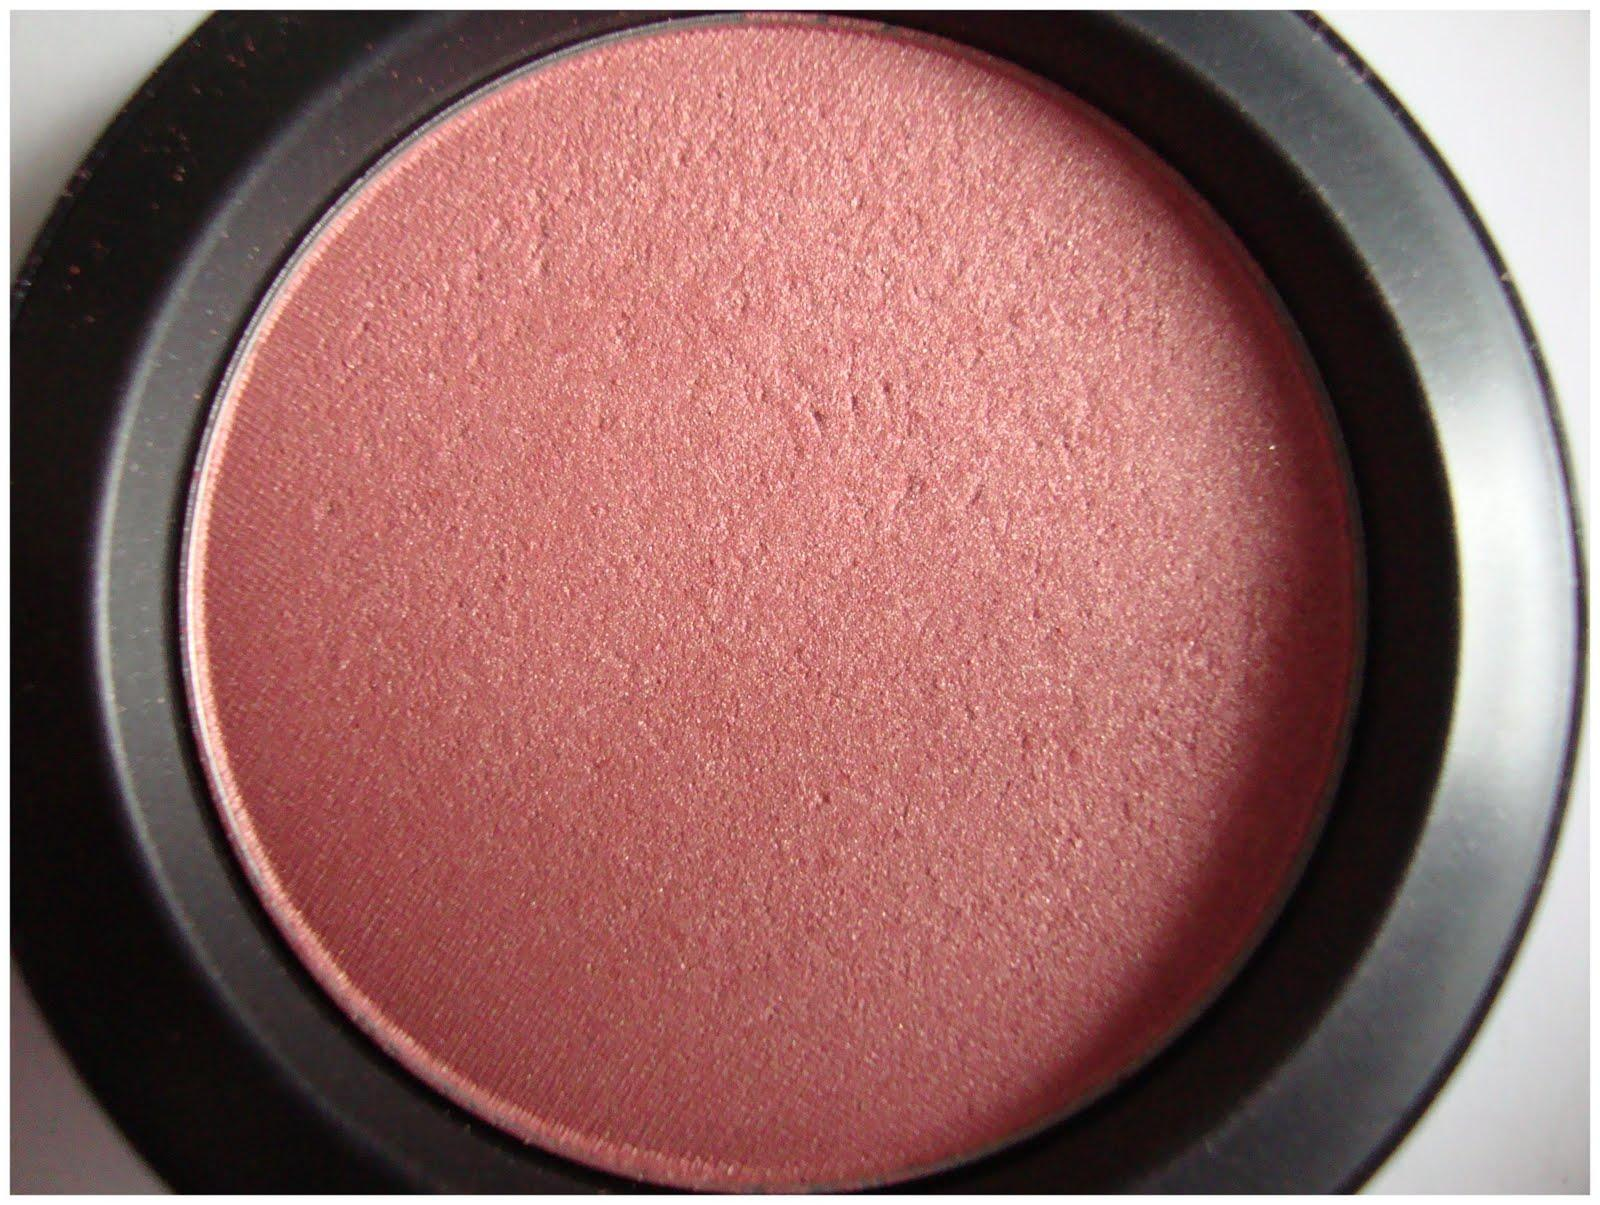 I will buy a matte blush,